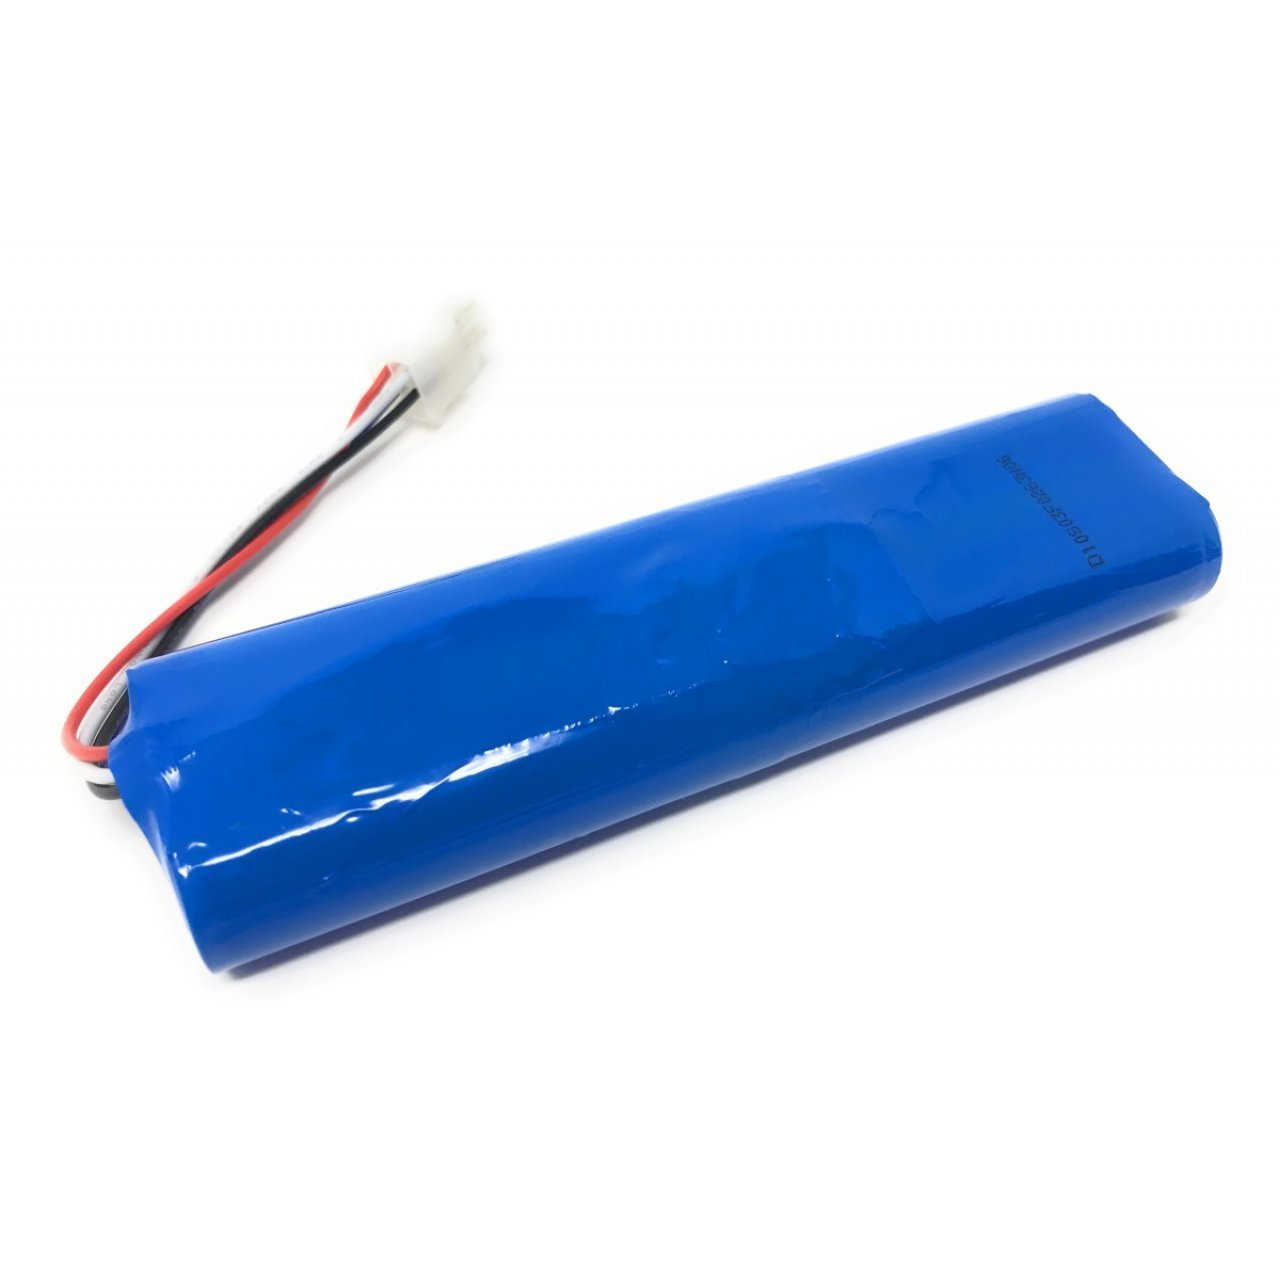 Powery Batería para Robot Aspirador Philips FC8705: Amazon.es: Electrónica